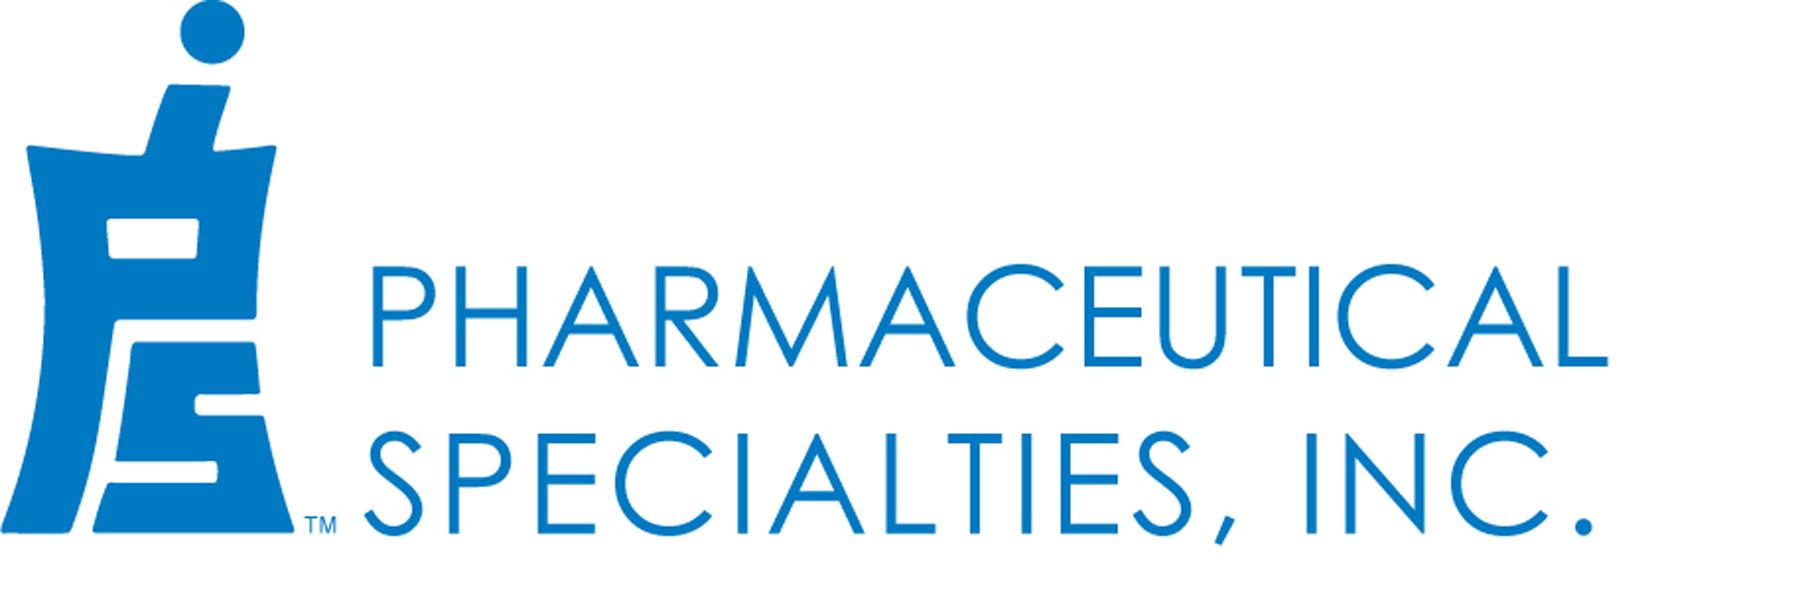 Pharmaceutical Specialties, Inc. logo